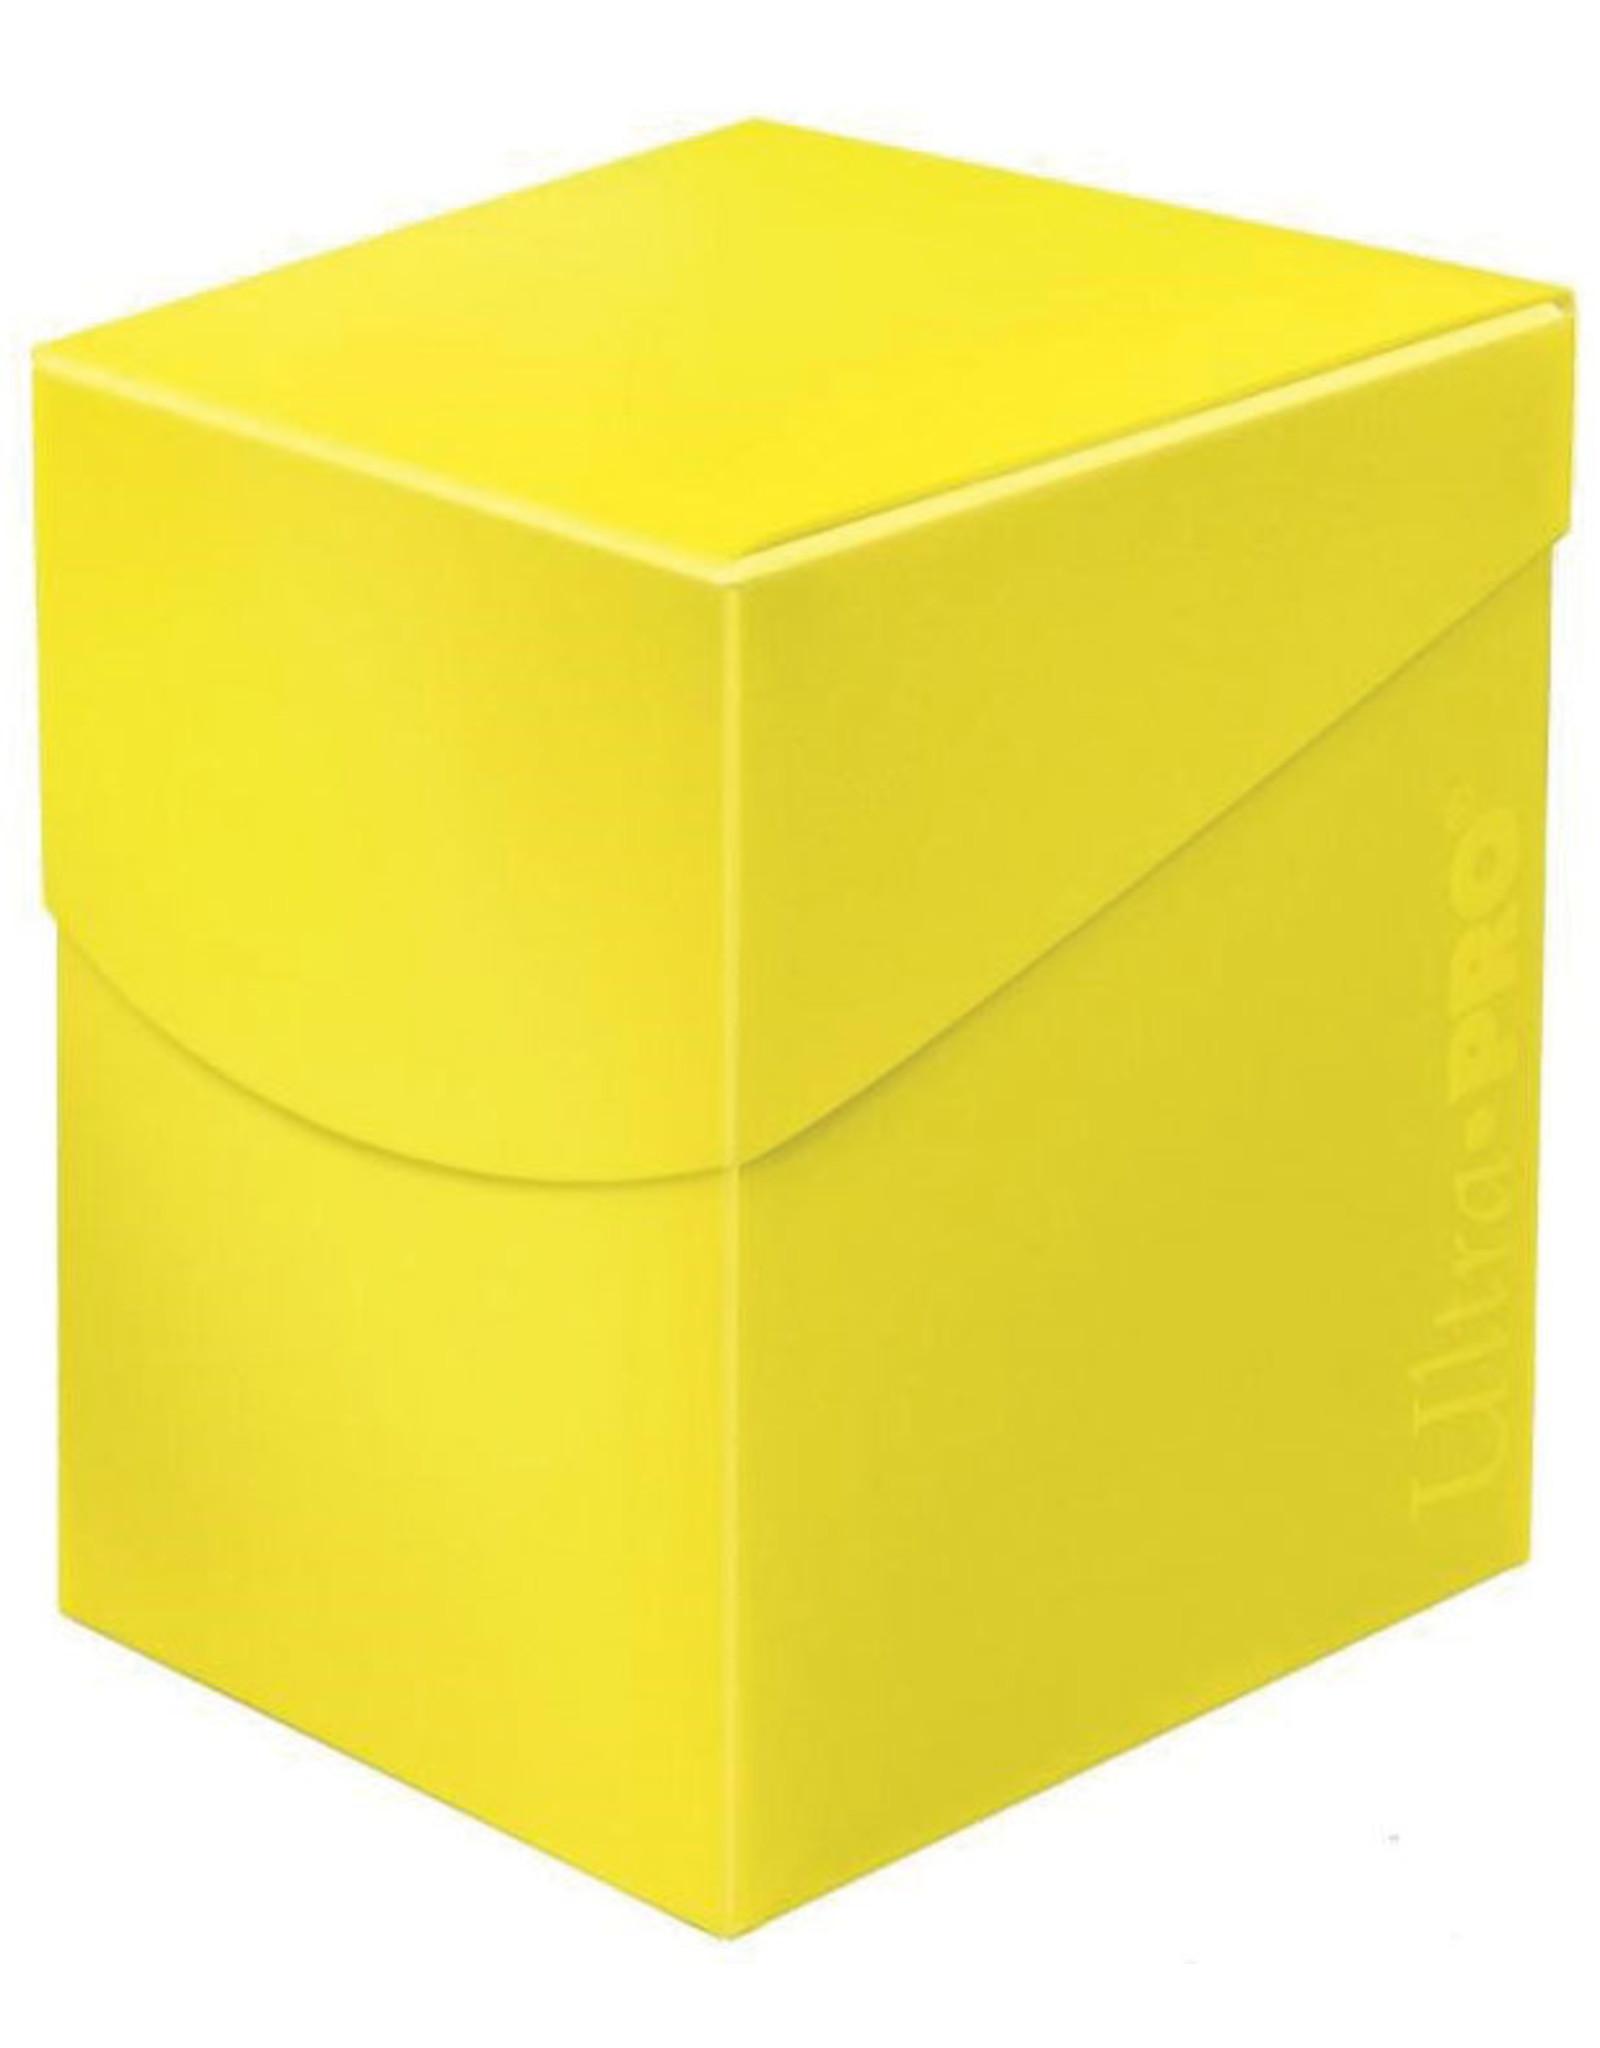 Ultra Pro Deck Box: PRO 100+: Eclipse: Lemon Yellow